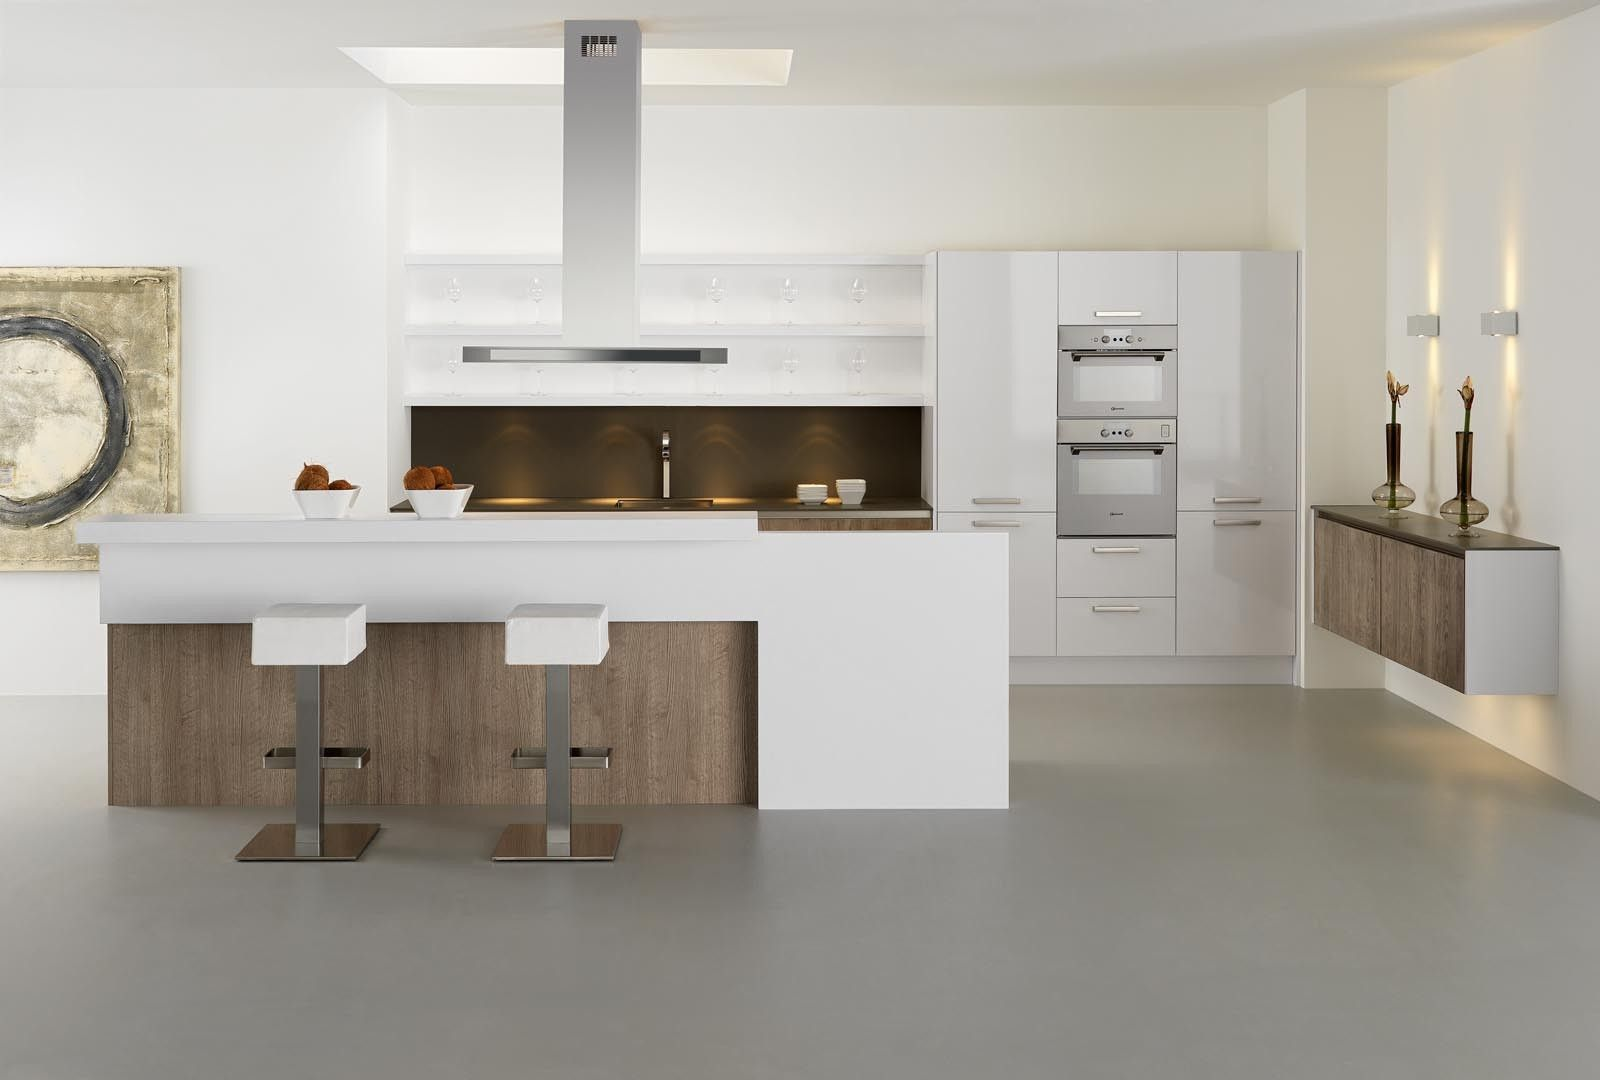 Keuken indeling home inspiration pinterest kitchens - Keuken indeling ...